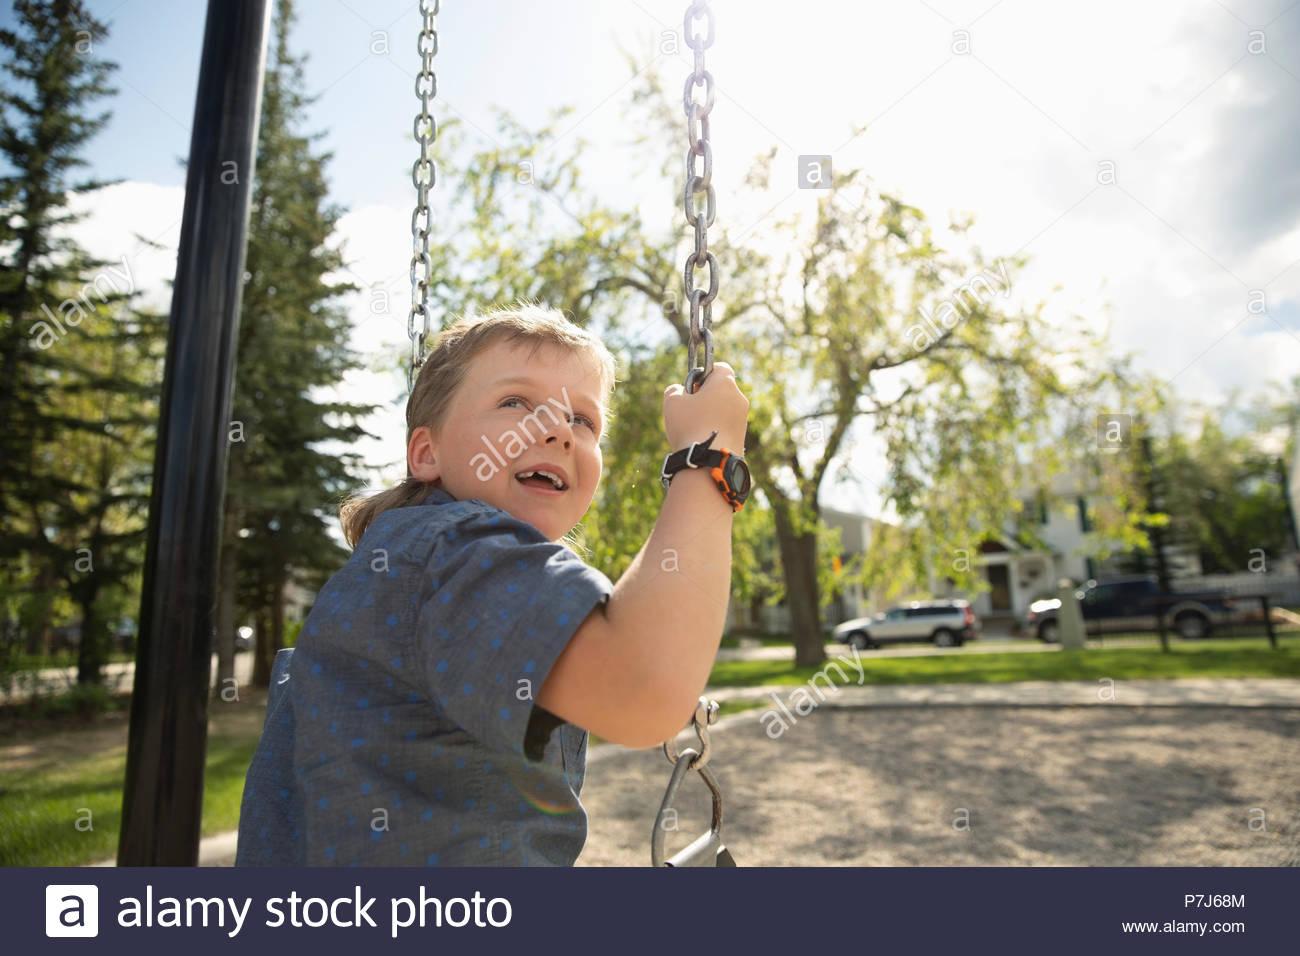 Smiling boy swinging at playground Stock Photo